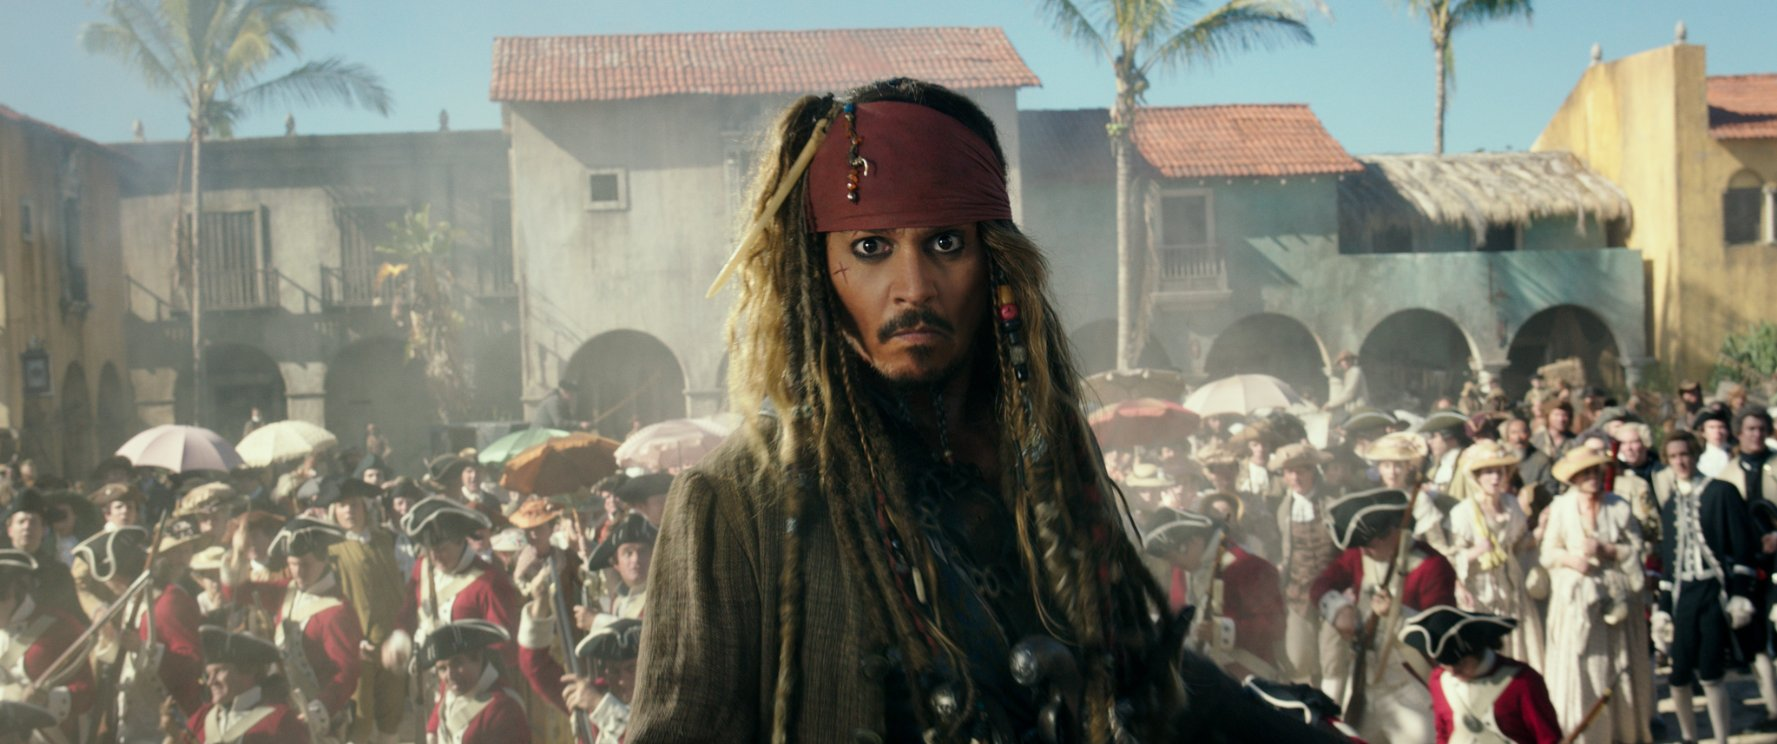 (6) film-piratite-od-karibite-odmazdata-na-salazar-pirates-of-the-caribbean-dead-men-tell-no-tales-www.kafepauza.mk